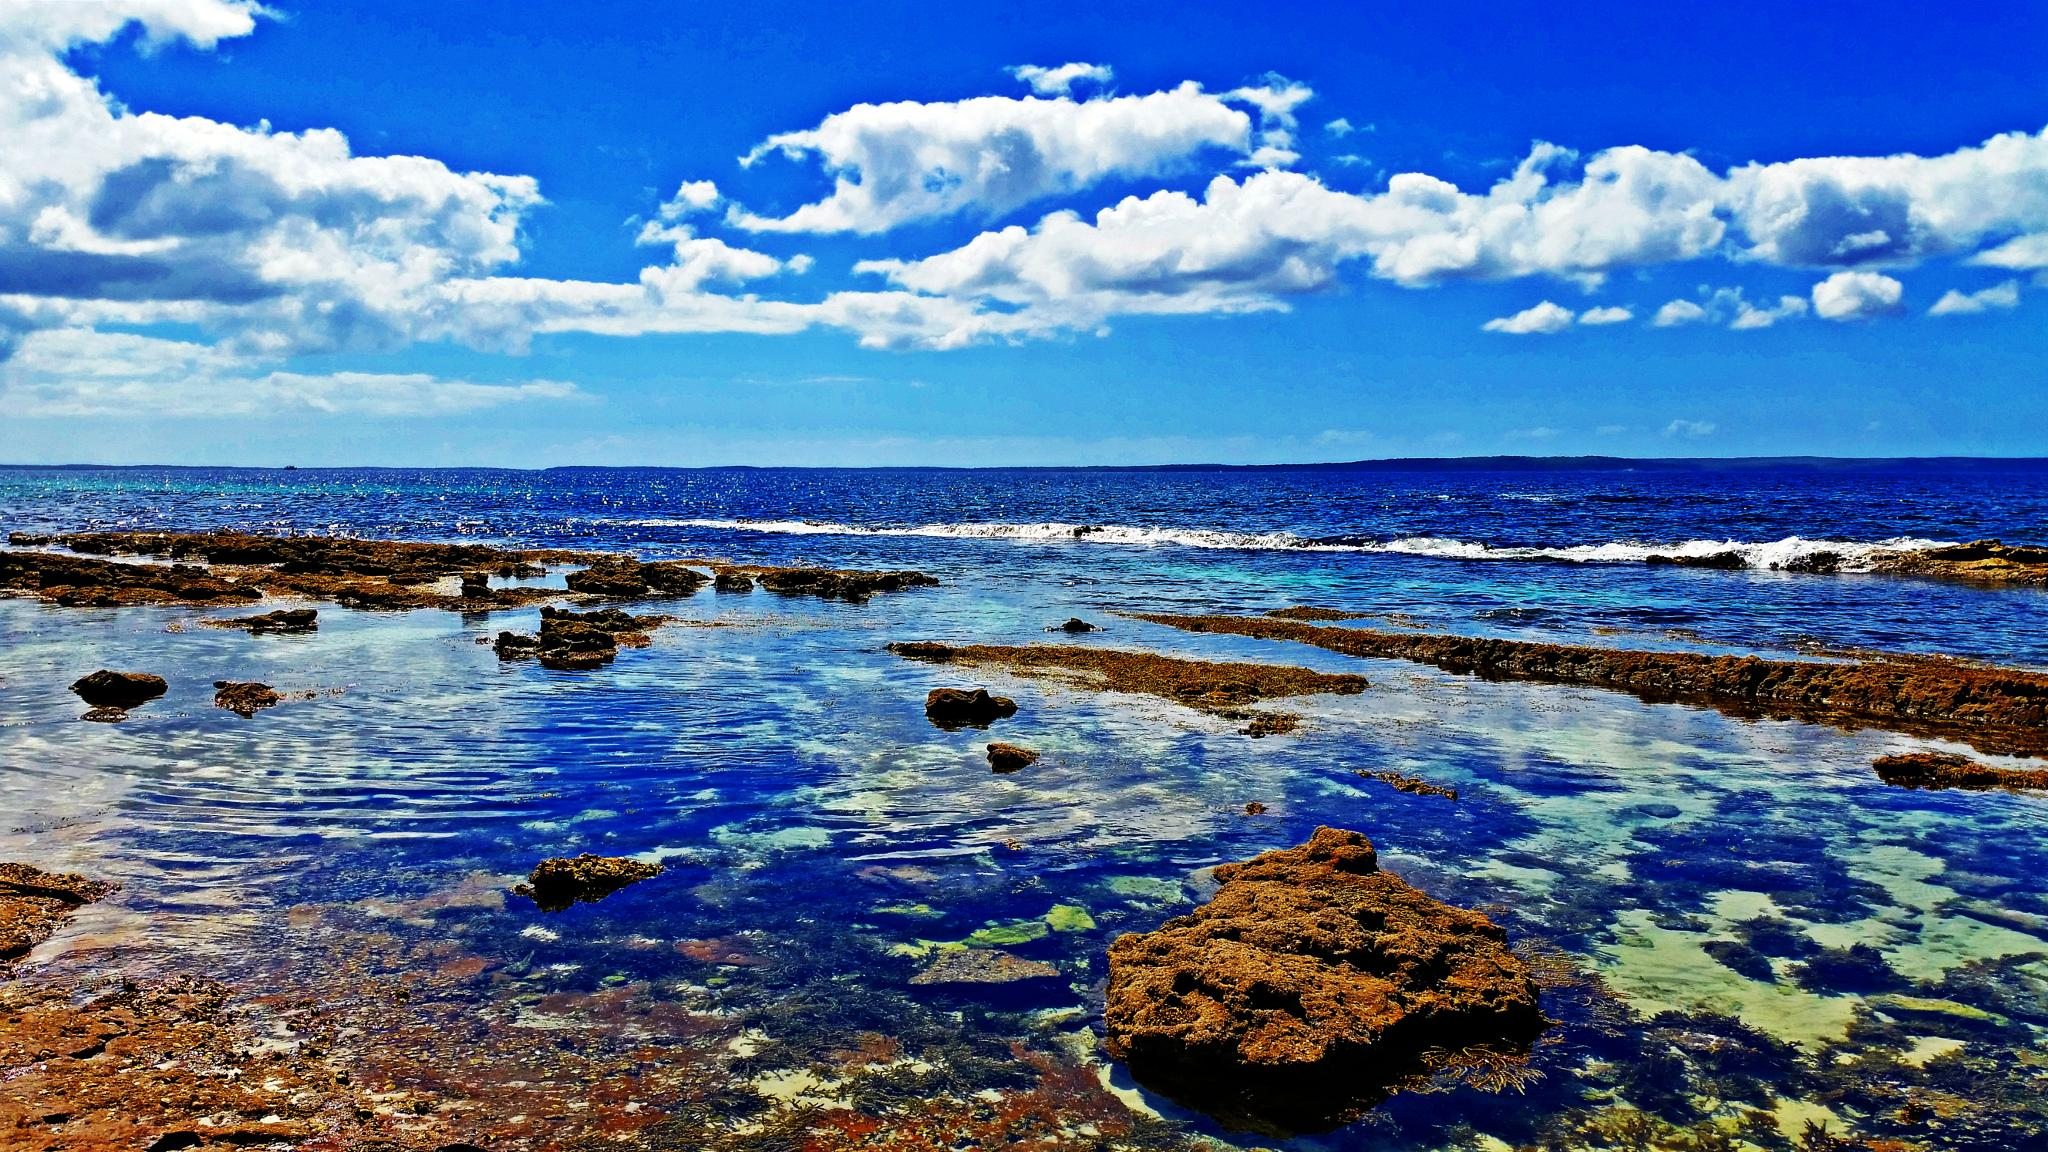 Hyams Beach NSW (A) by Theresa Duong